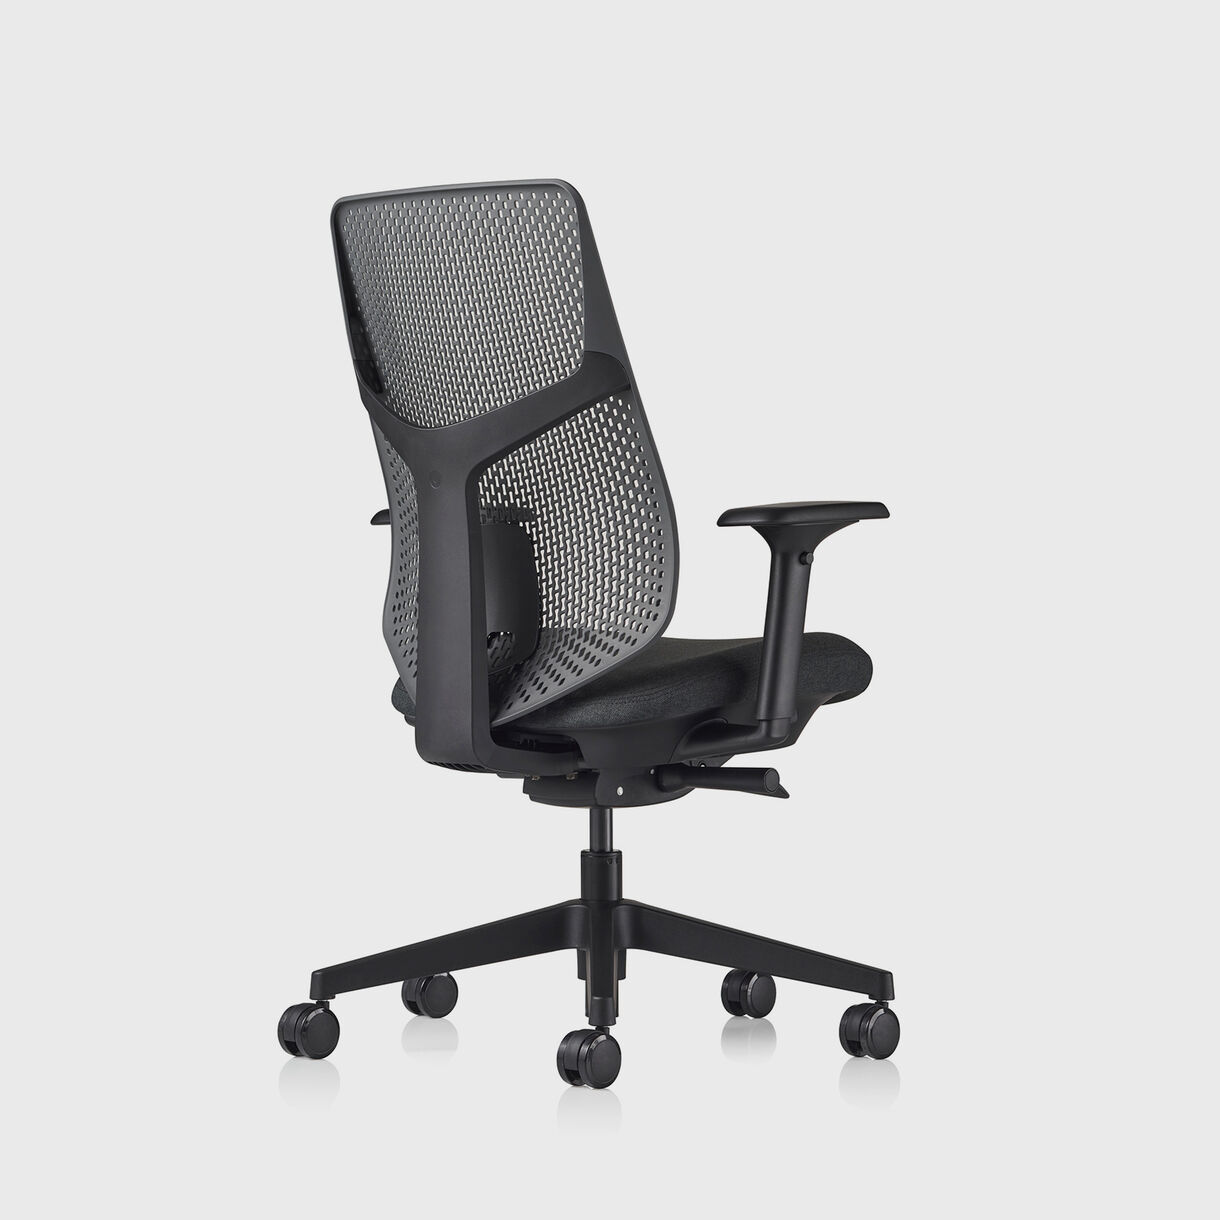 Verus TriFlex Back Task Chair - Black Frame, Dark Carbon TriFlex & Cinder Upholstery - Fully Adjustable Arms